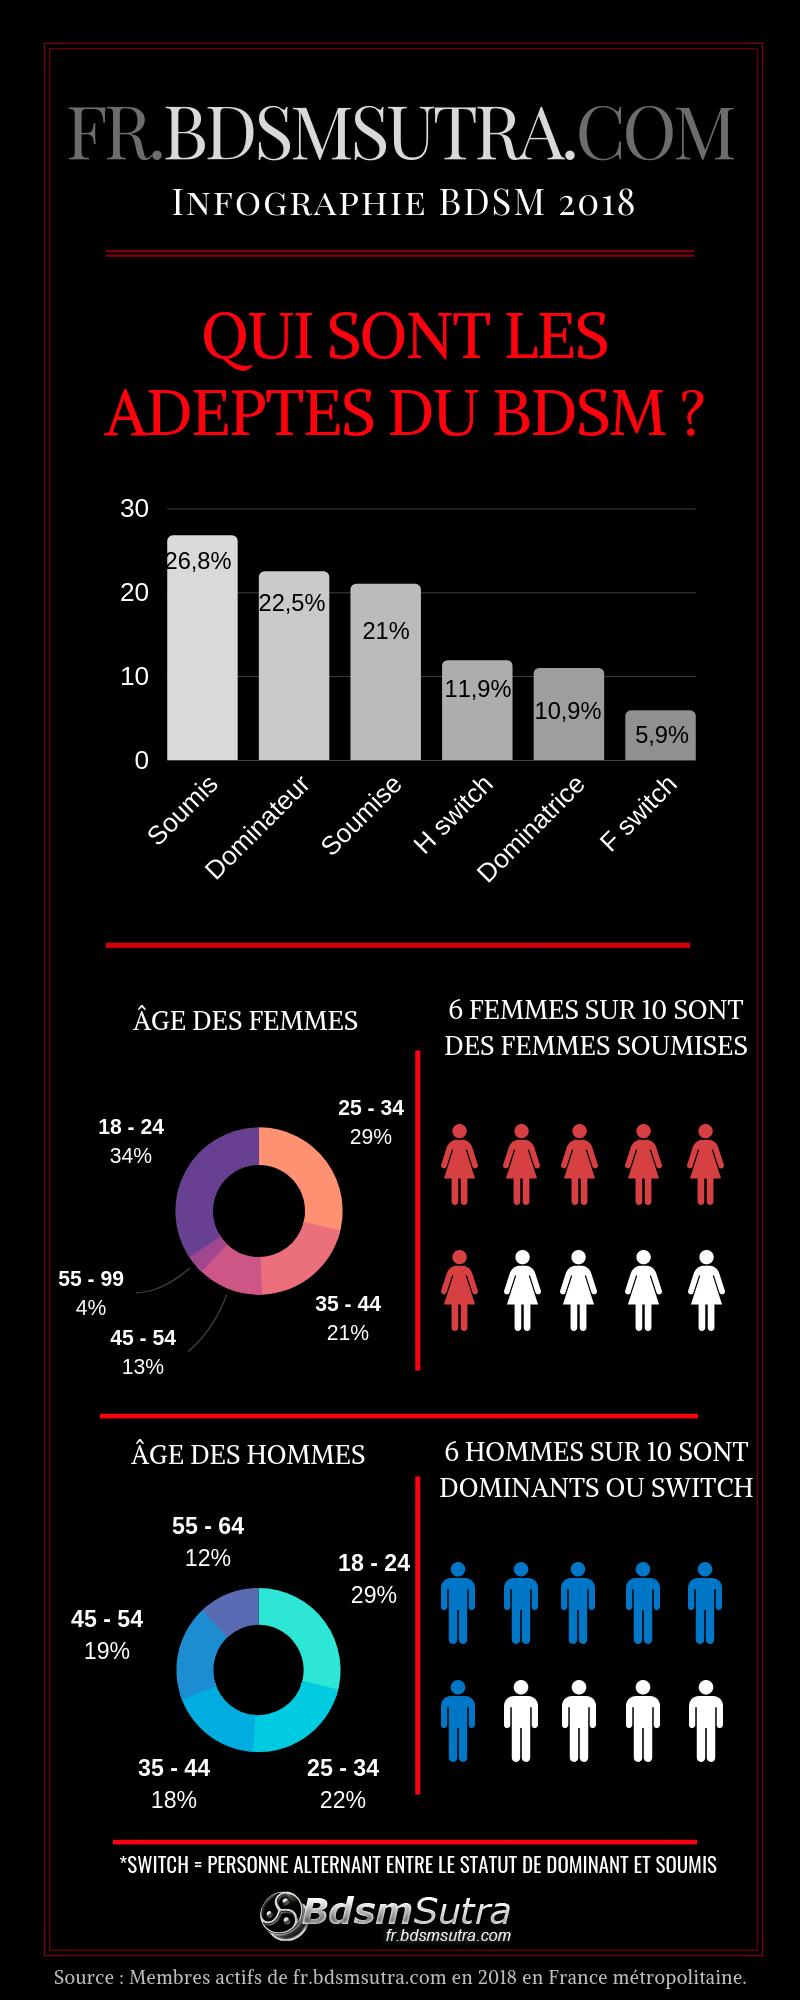 Infographie BDSM 2018